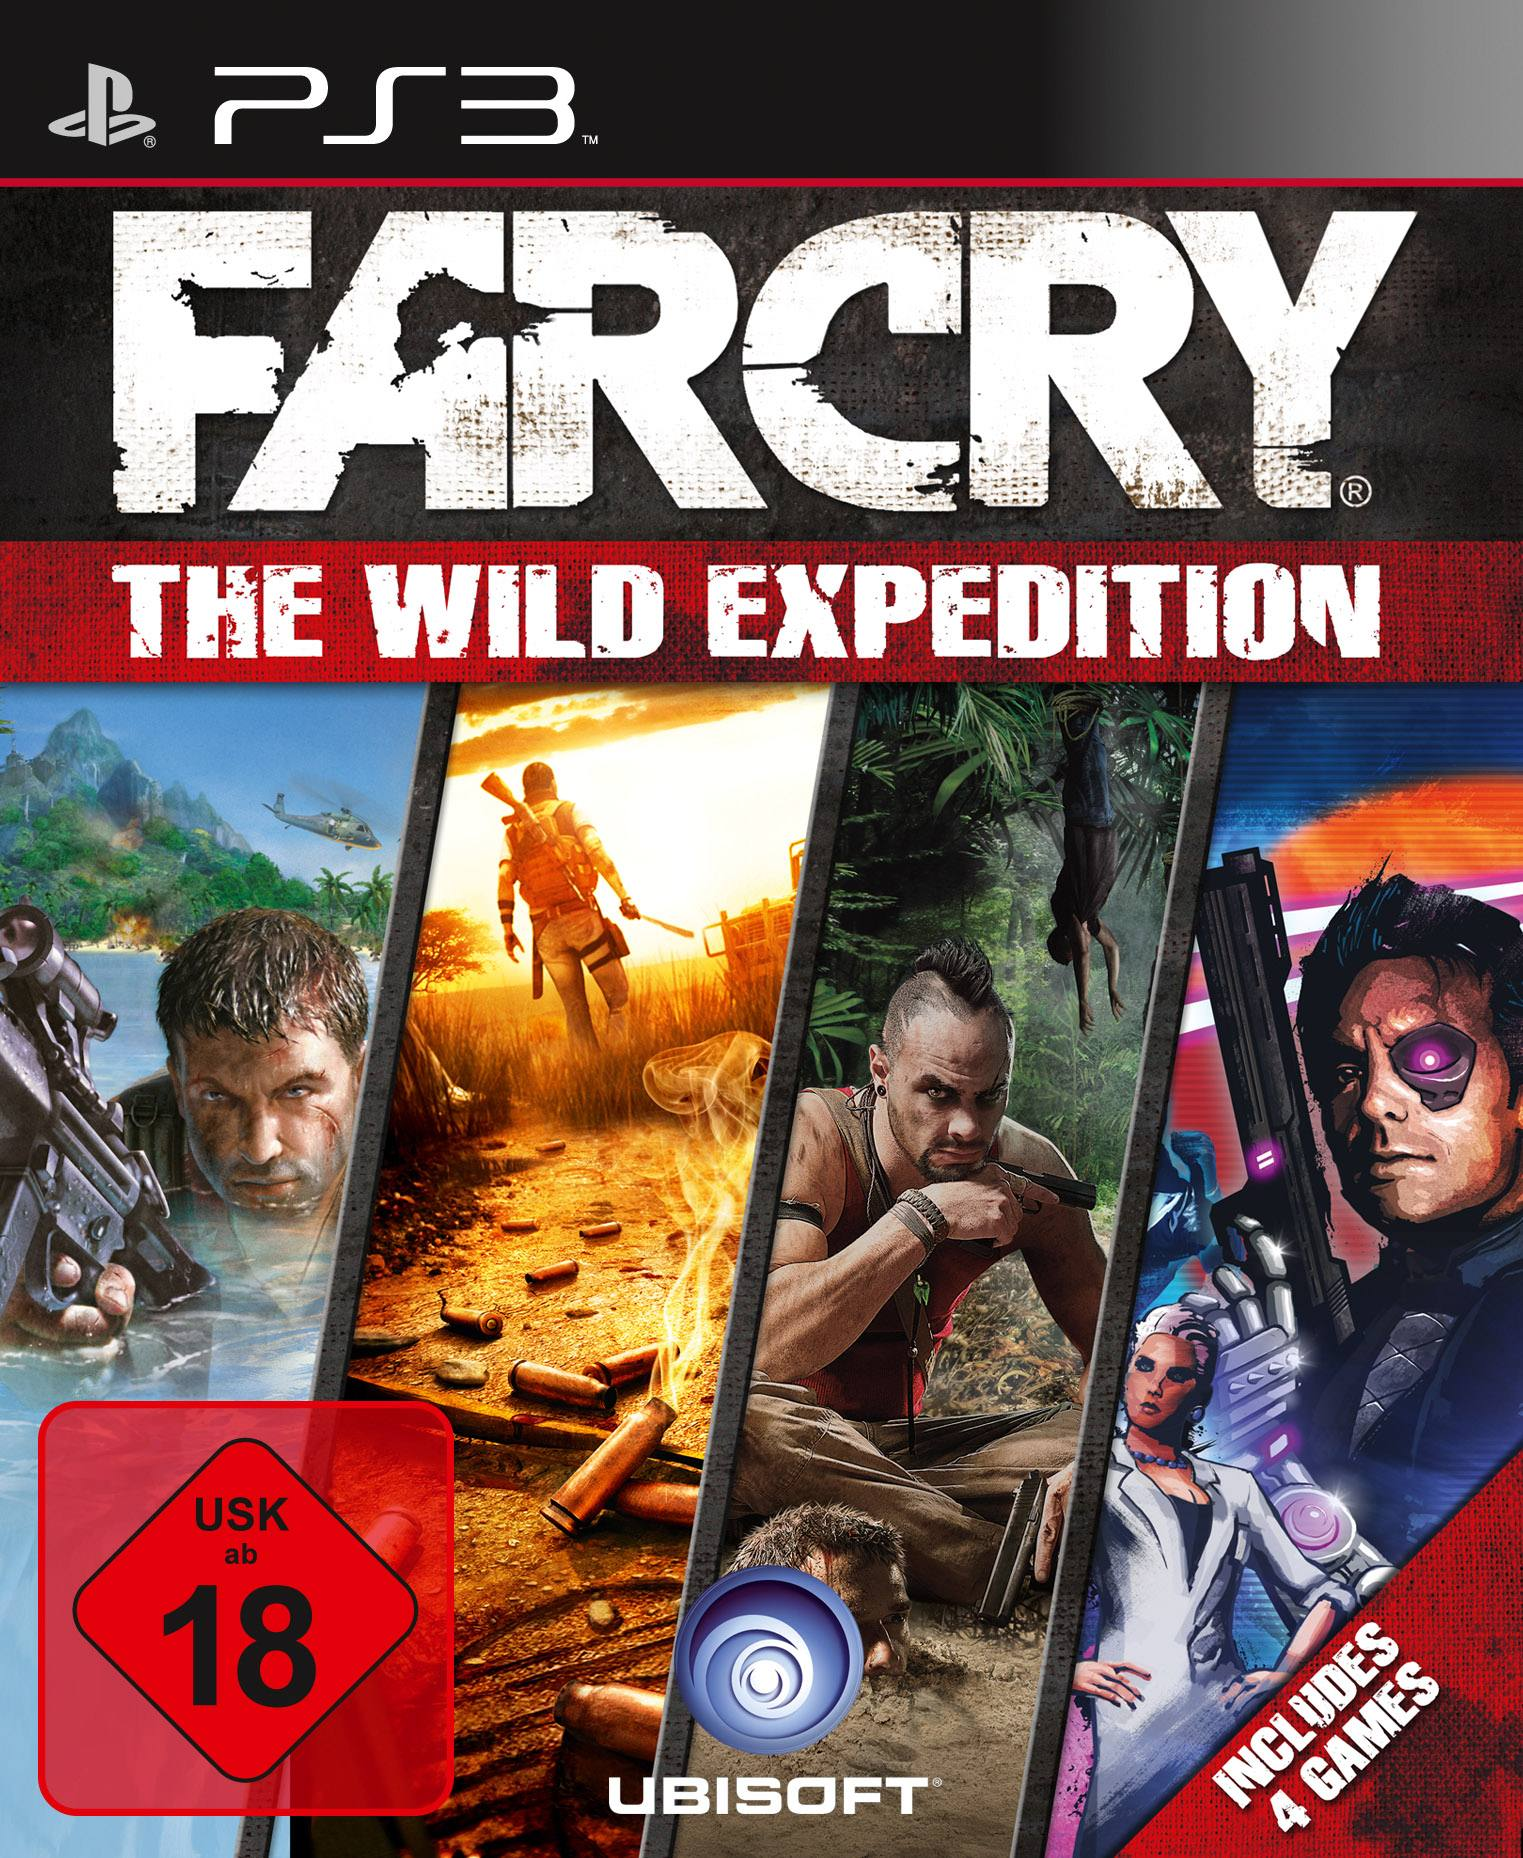 FC_PS3_pack_2D_usk_sm-pc-games.jpg